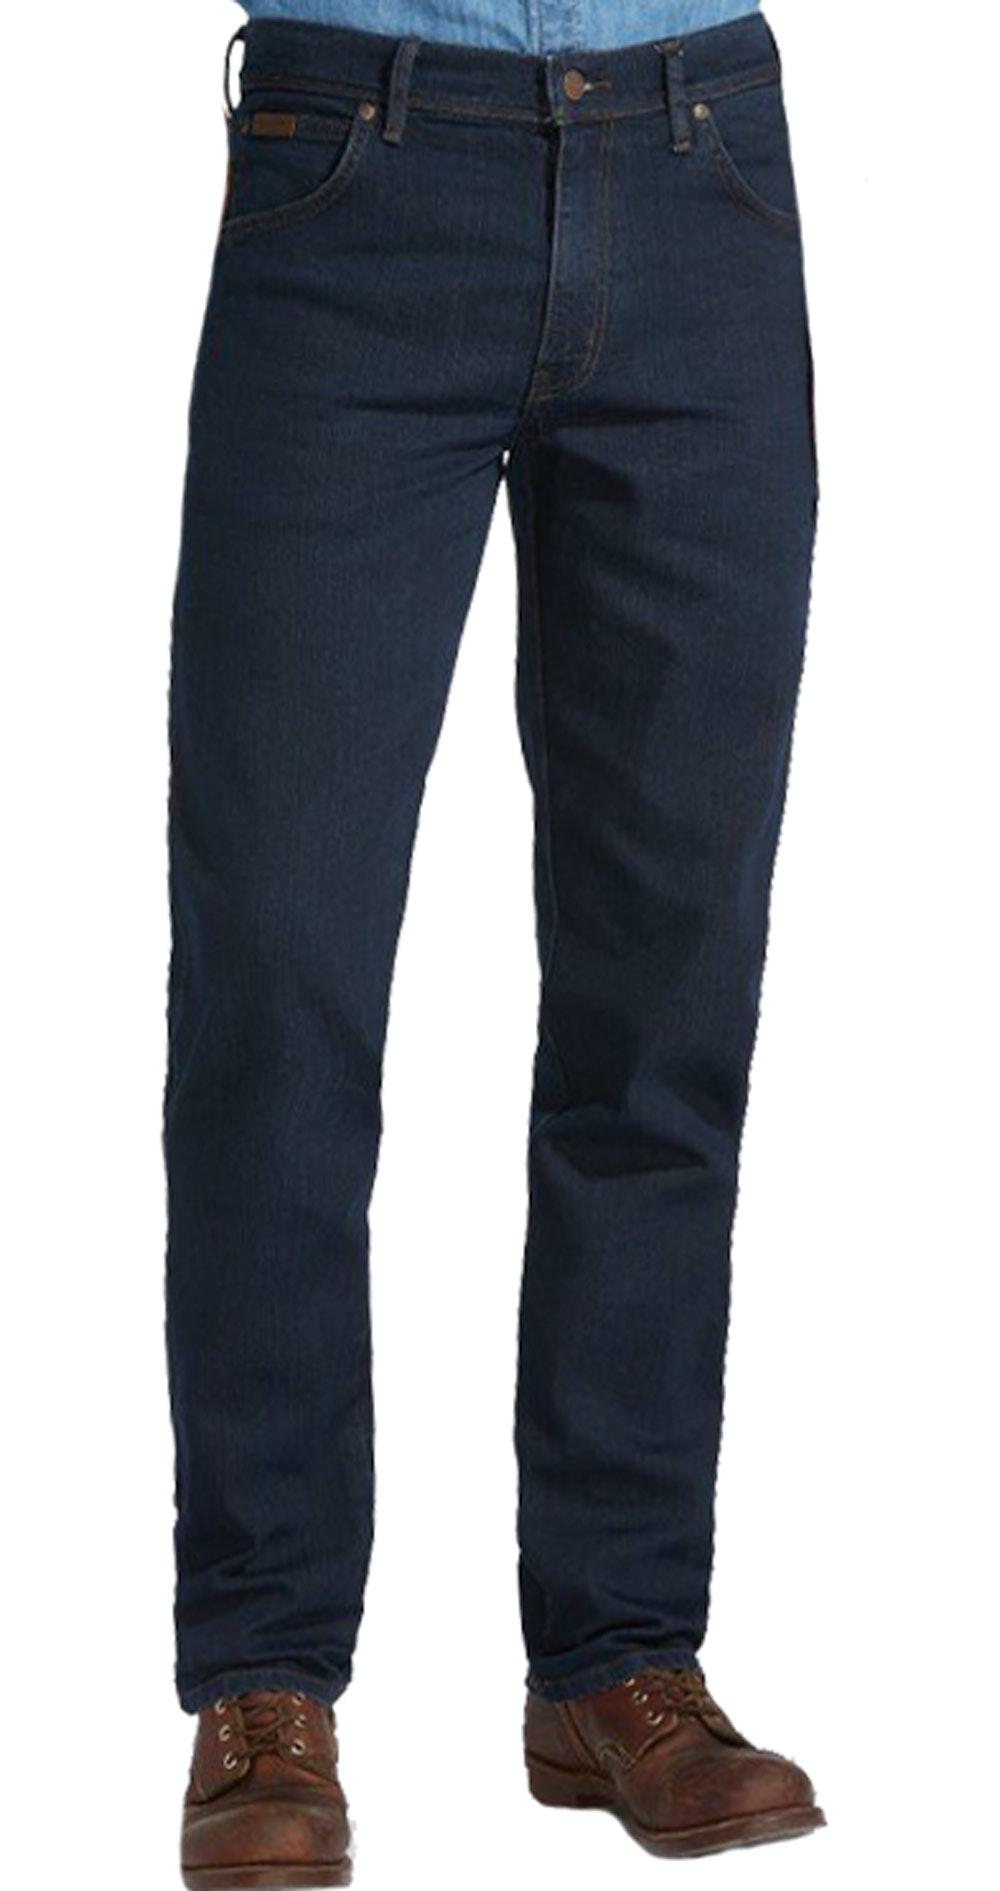 Wrangler Texas Stretch Dark Denim Jeans